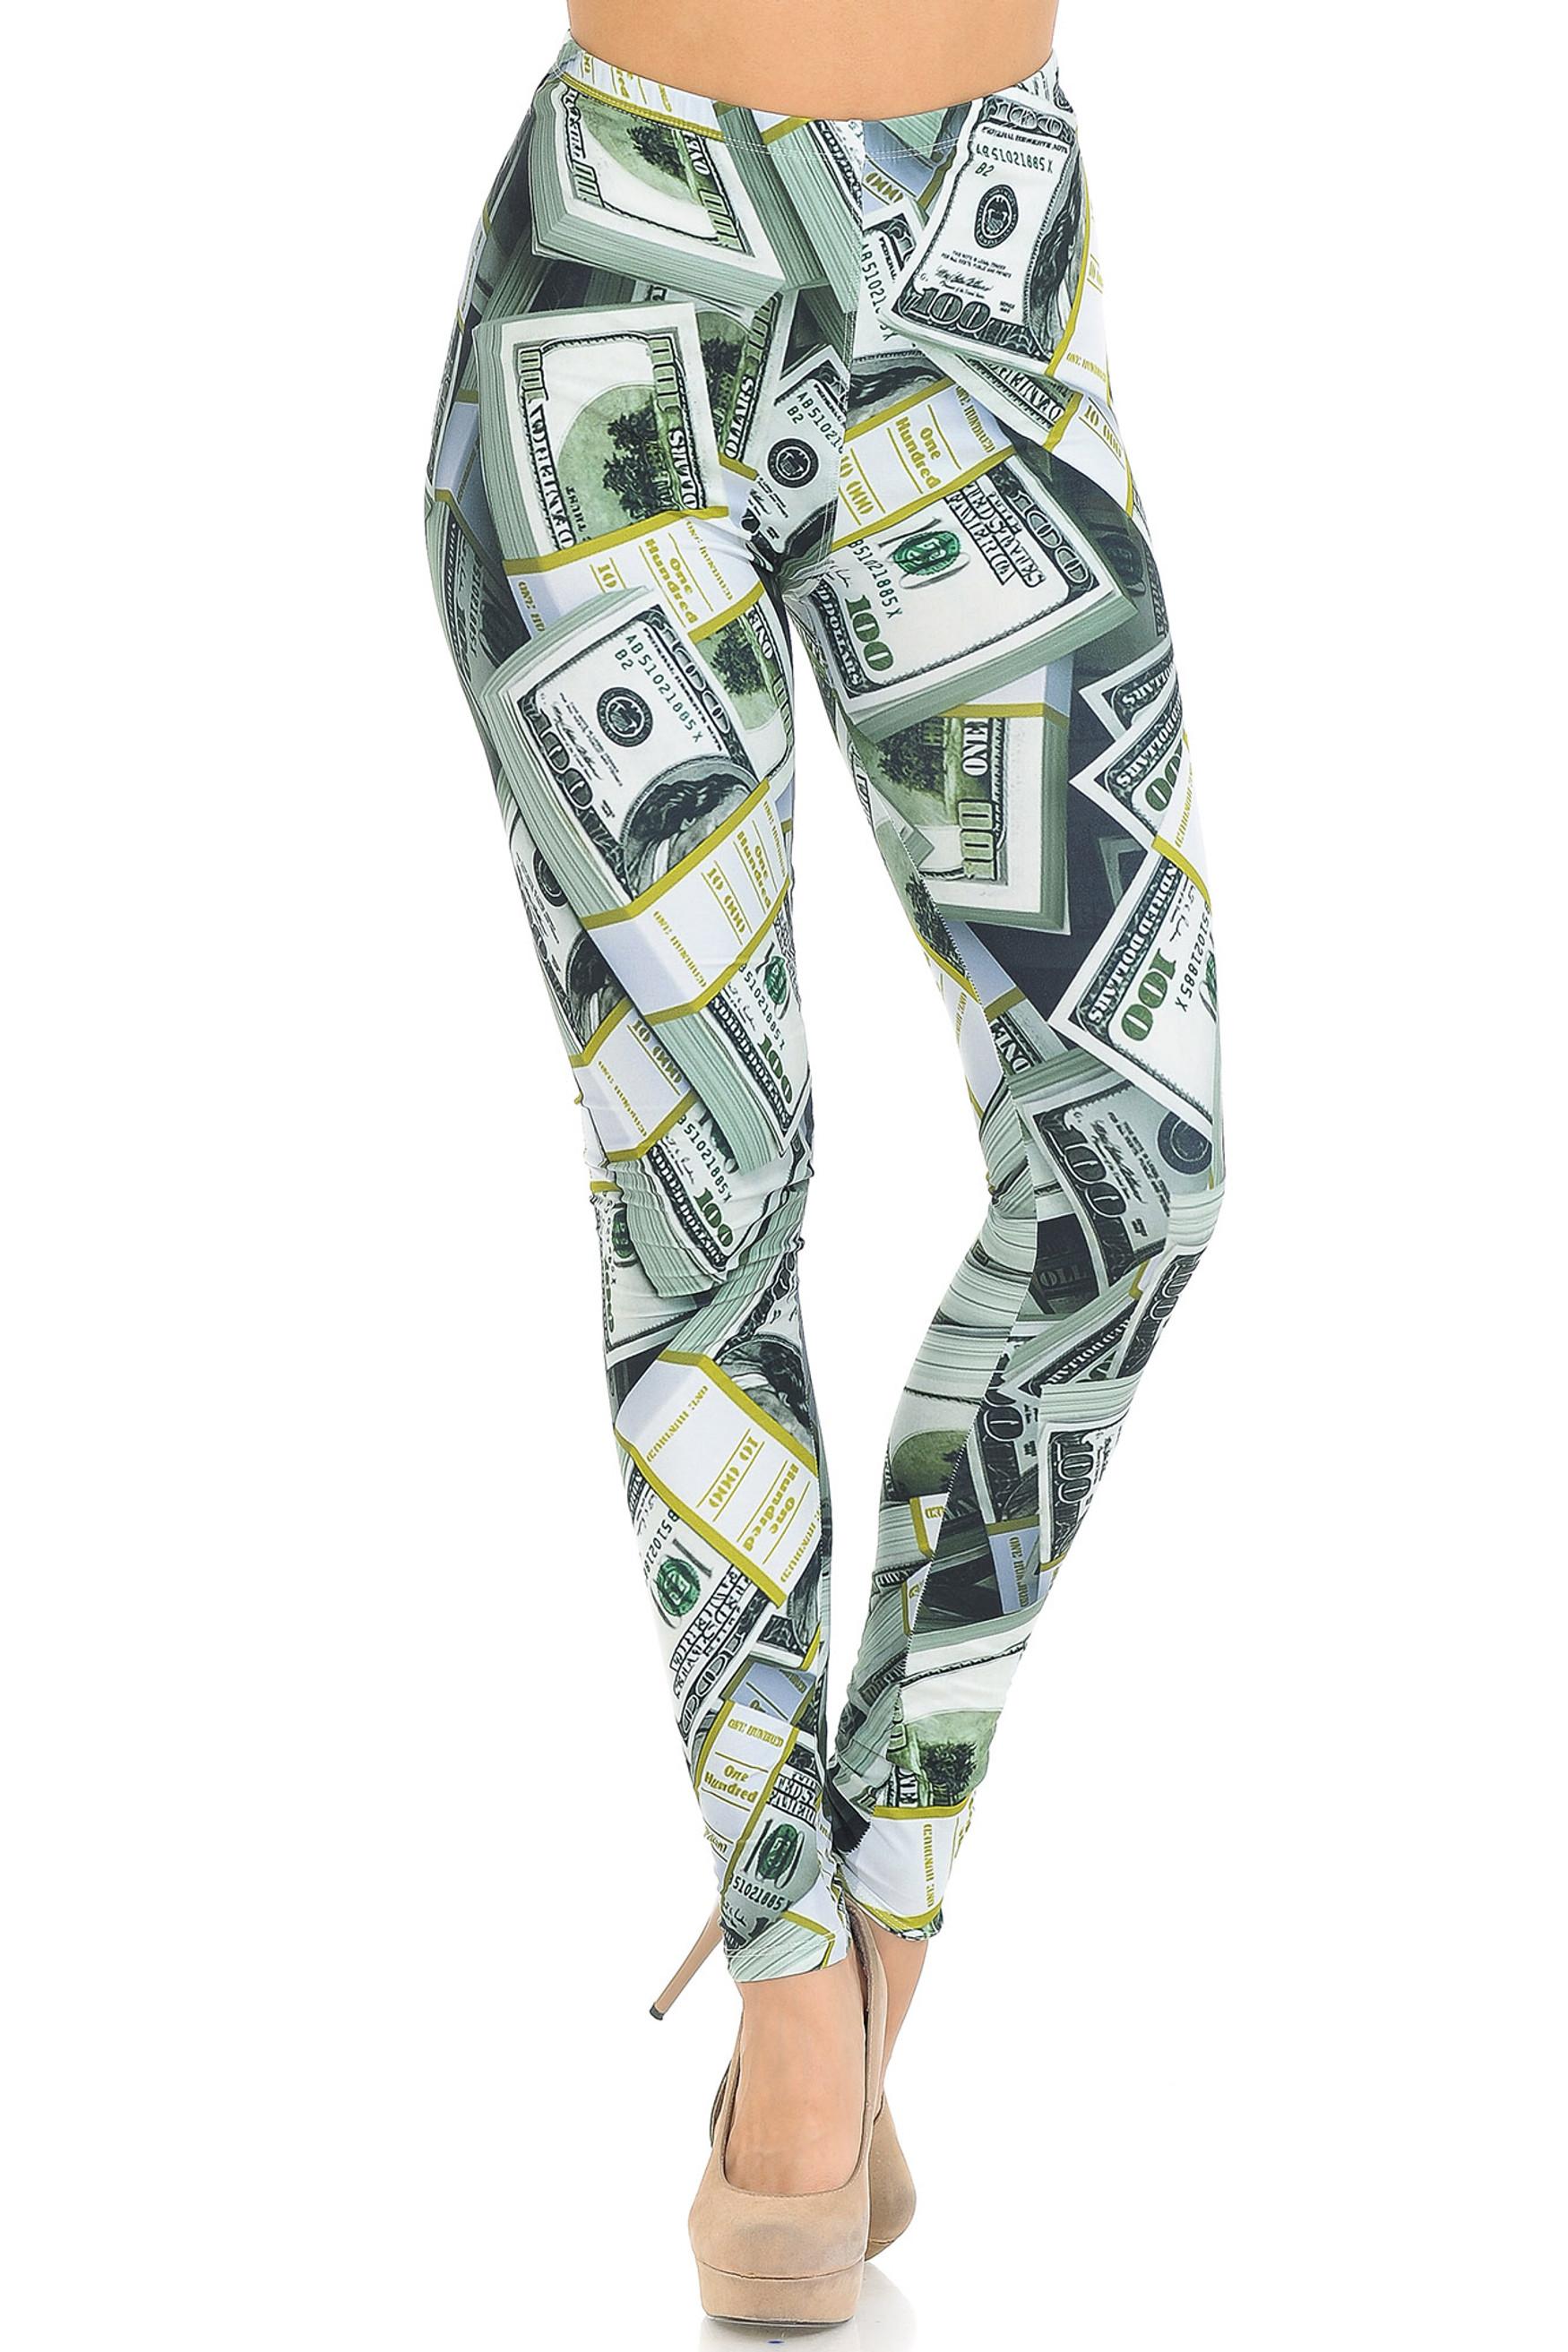 Creamy Soft Cash Money Leggings - USA Fashion™